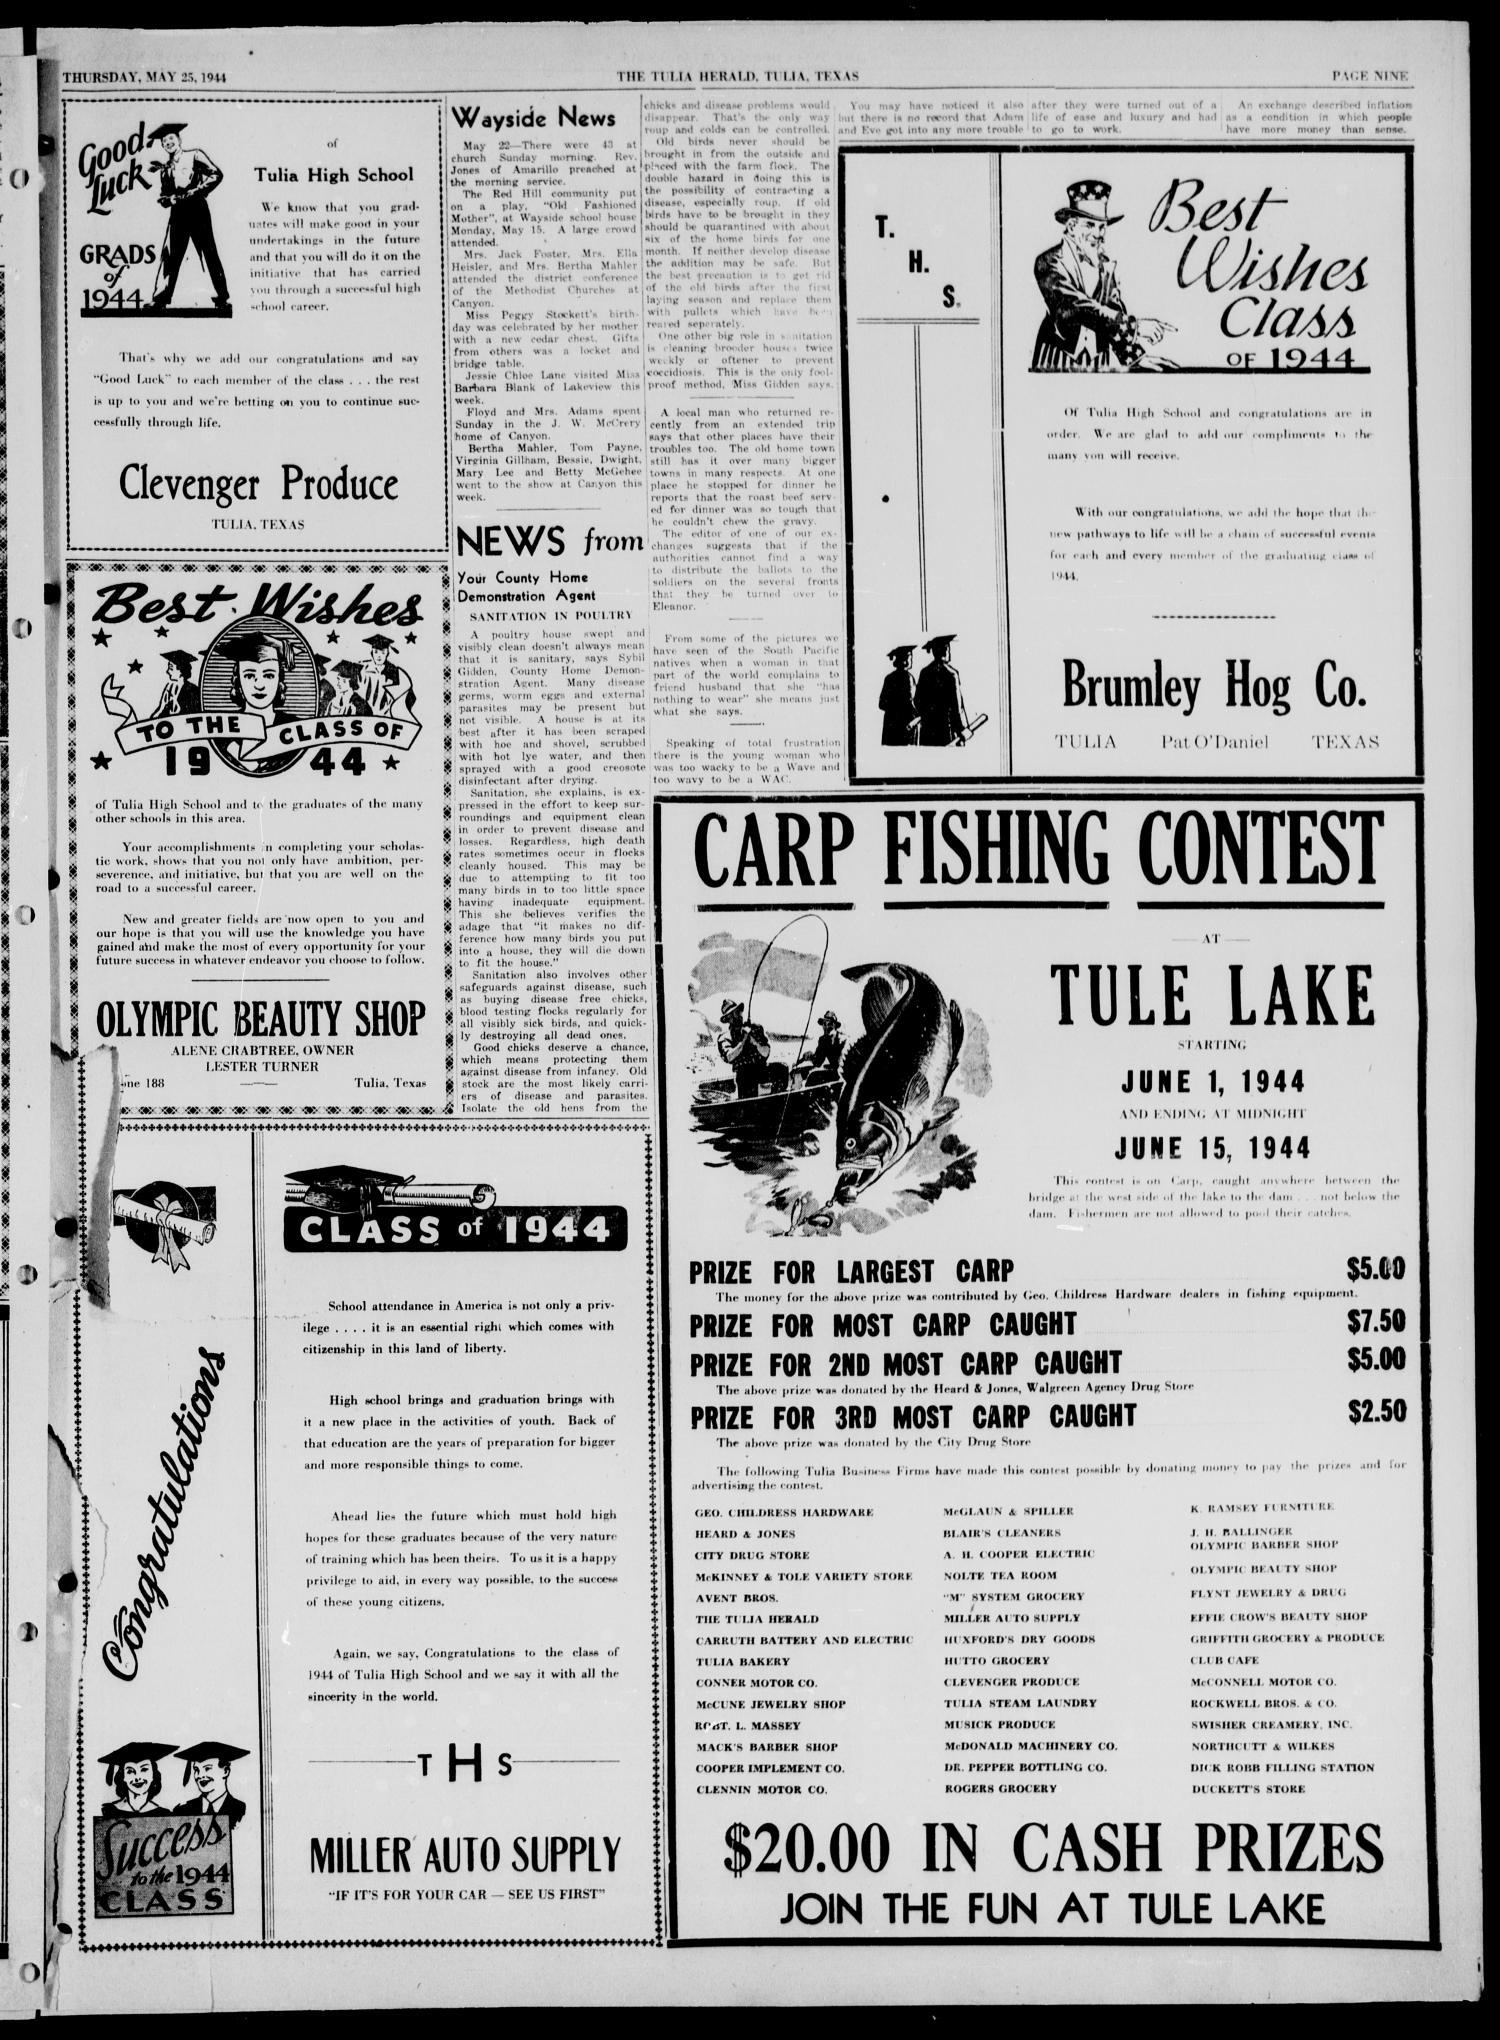 The Tulia Herald (Tulia, Tex), Vol  35, No  21, Ed  1